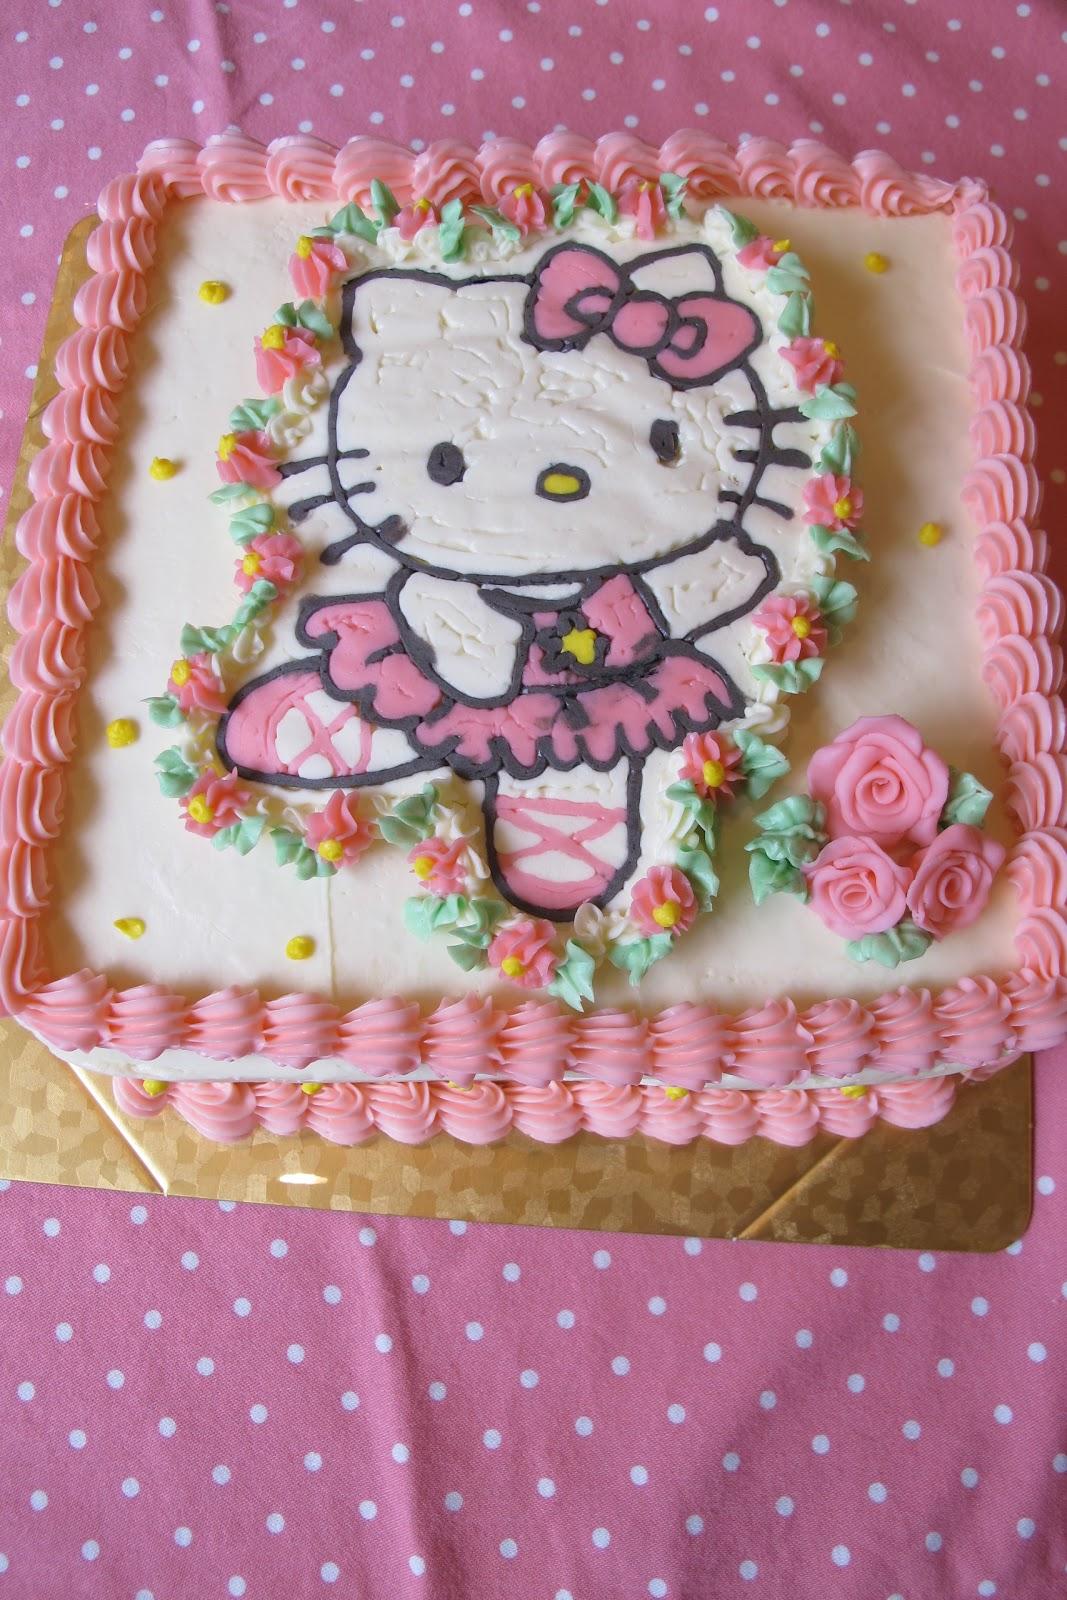 157a901d9 Tortelicious: Hello Kitty Cake